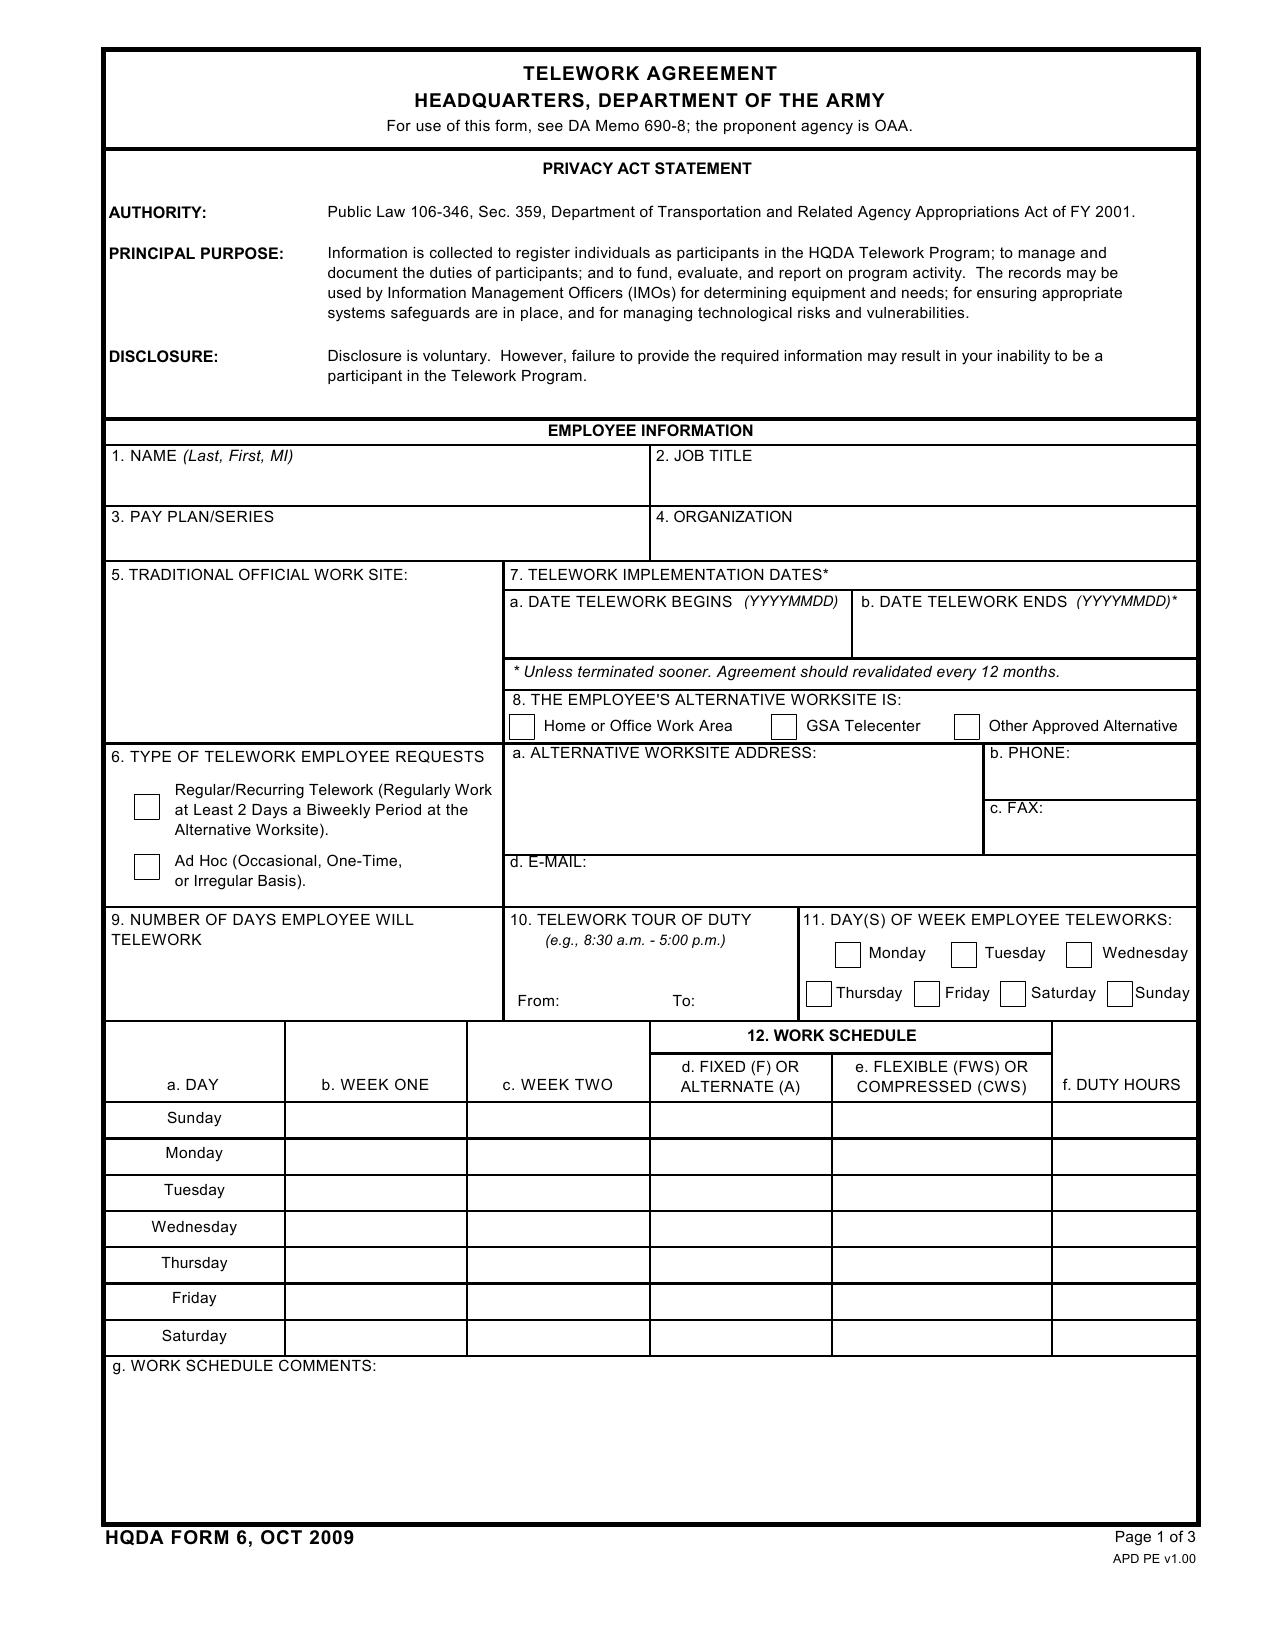 Download Da Form Hqda6 Telework Agreement Headquarters Department